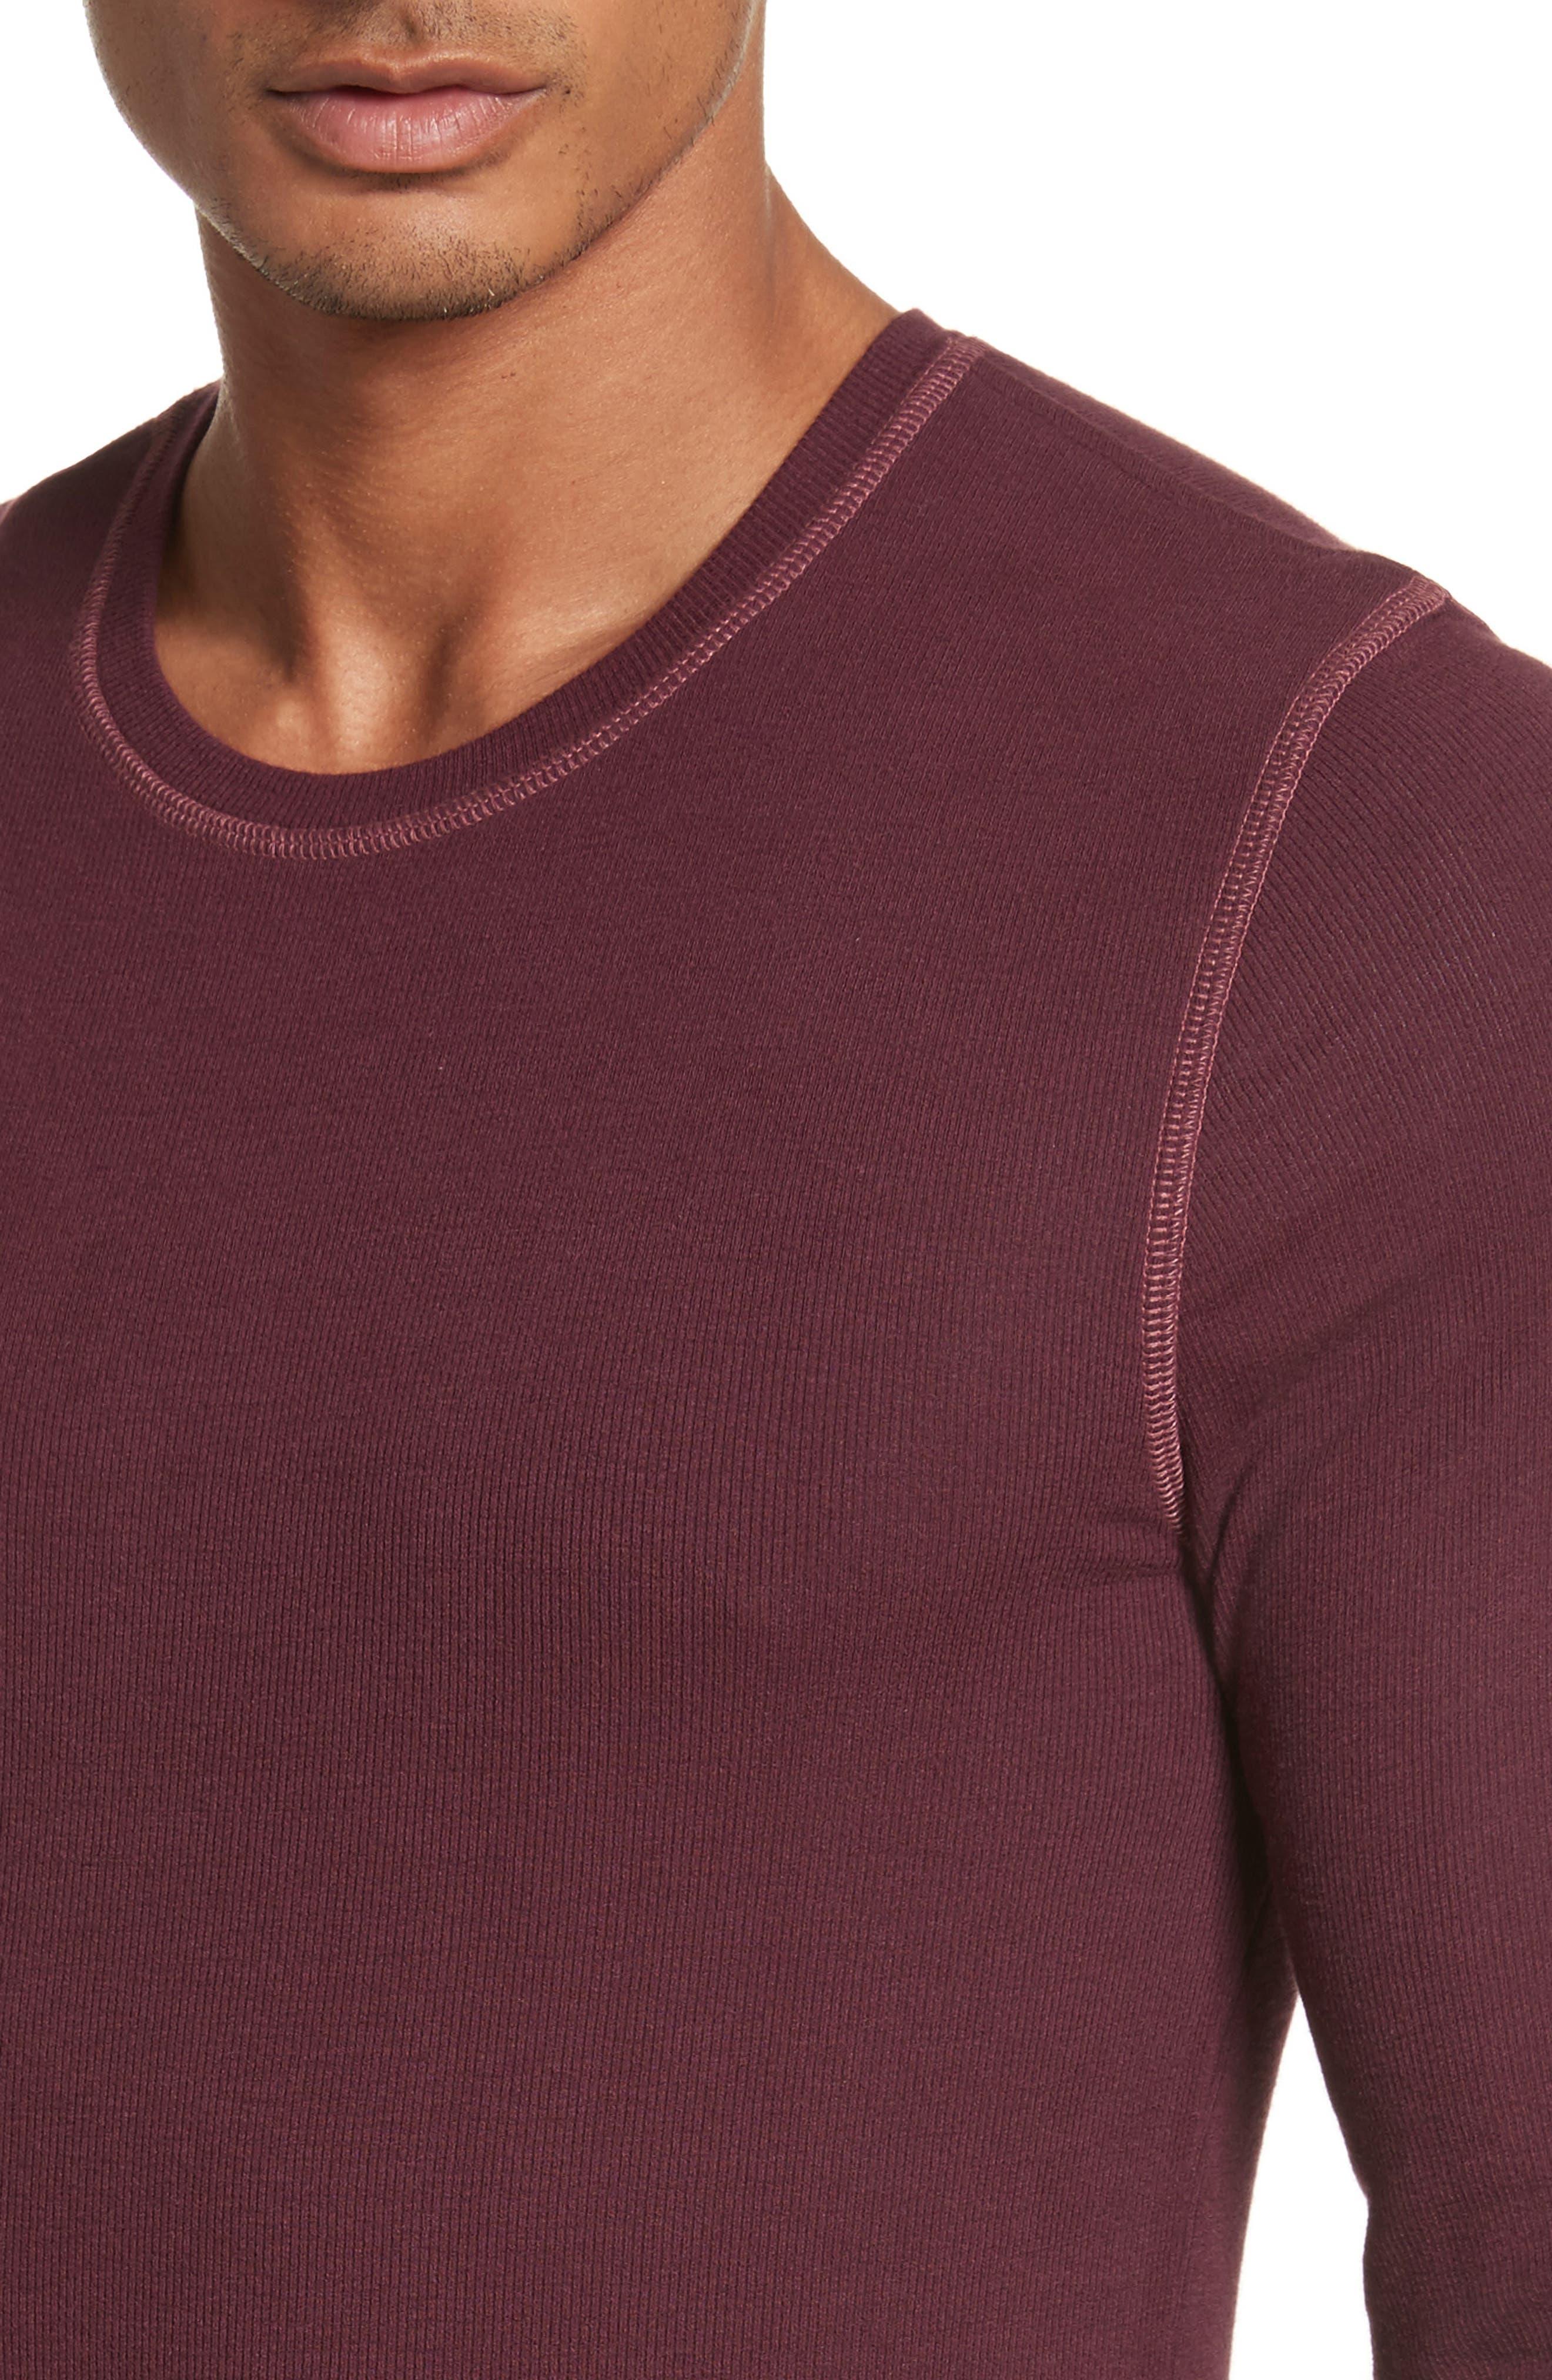 Rib Modal Crewneck Sweater,                             Alternate thumbnail 4, color,                             Merlot